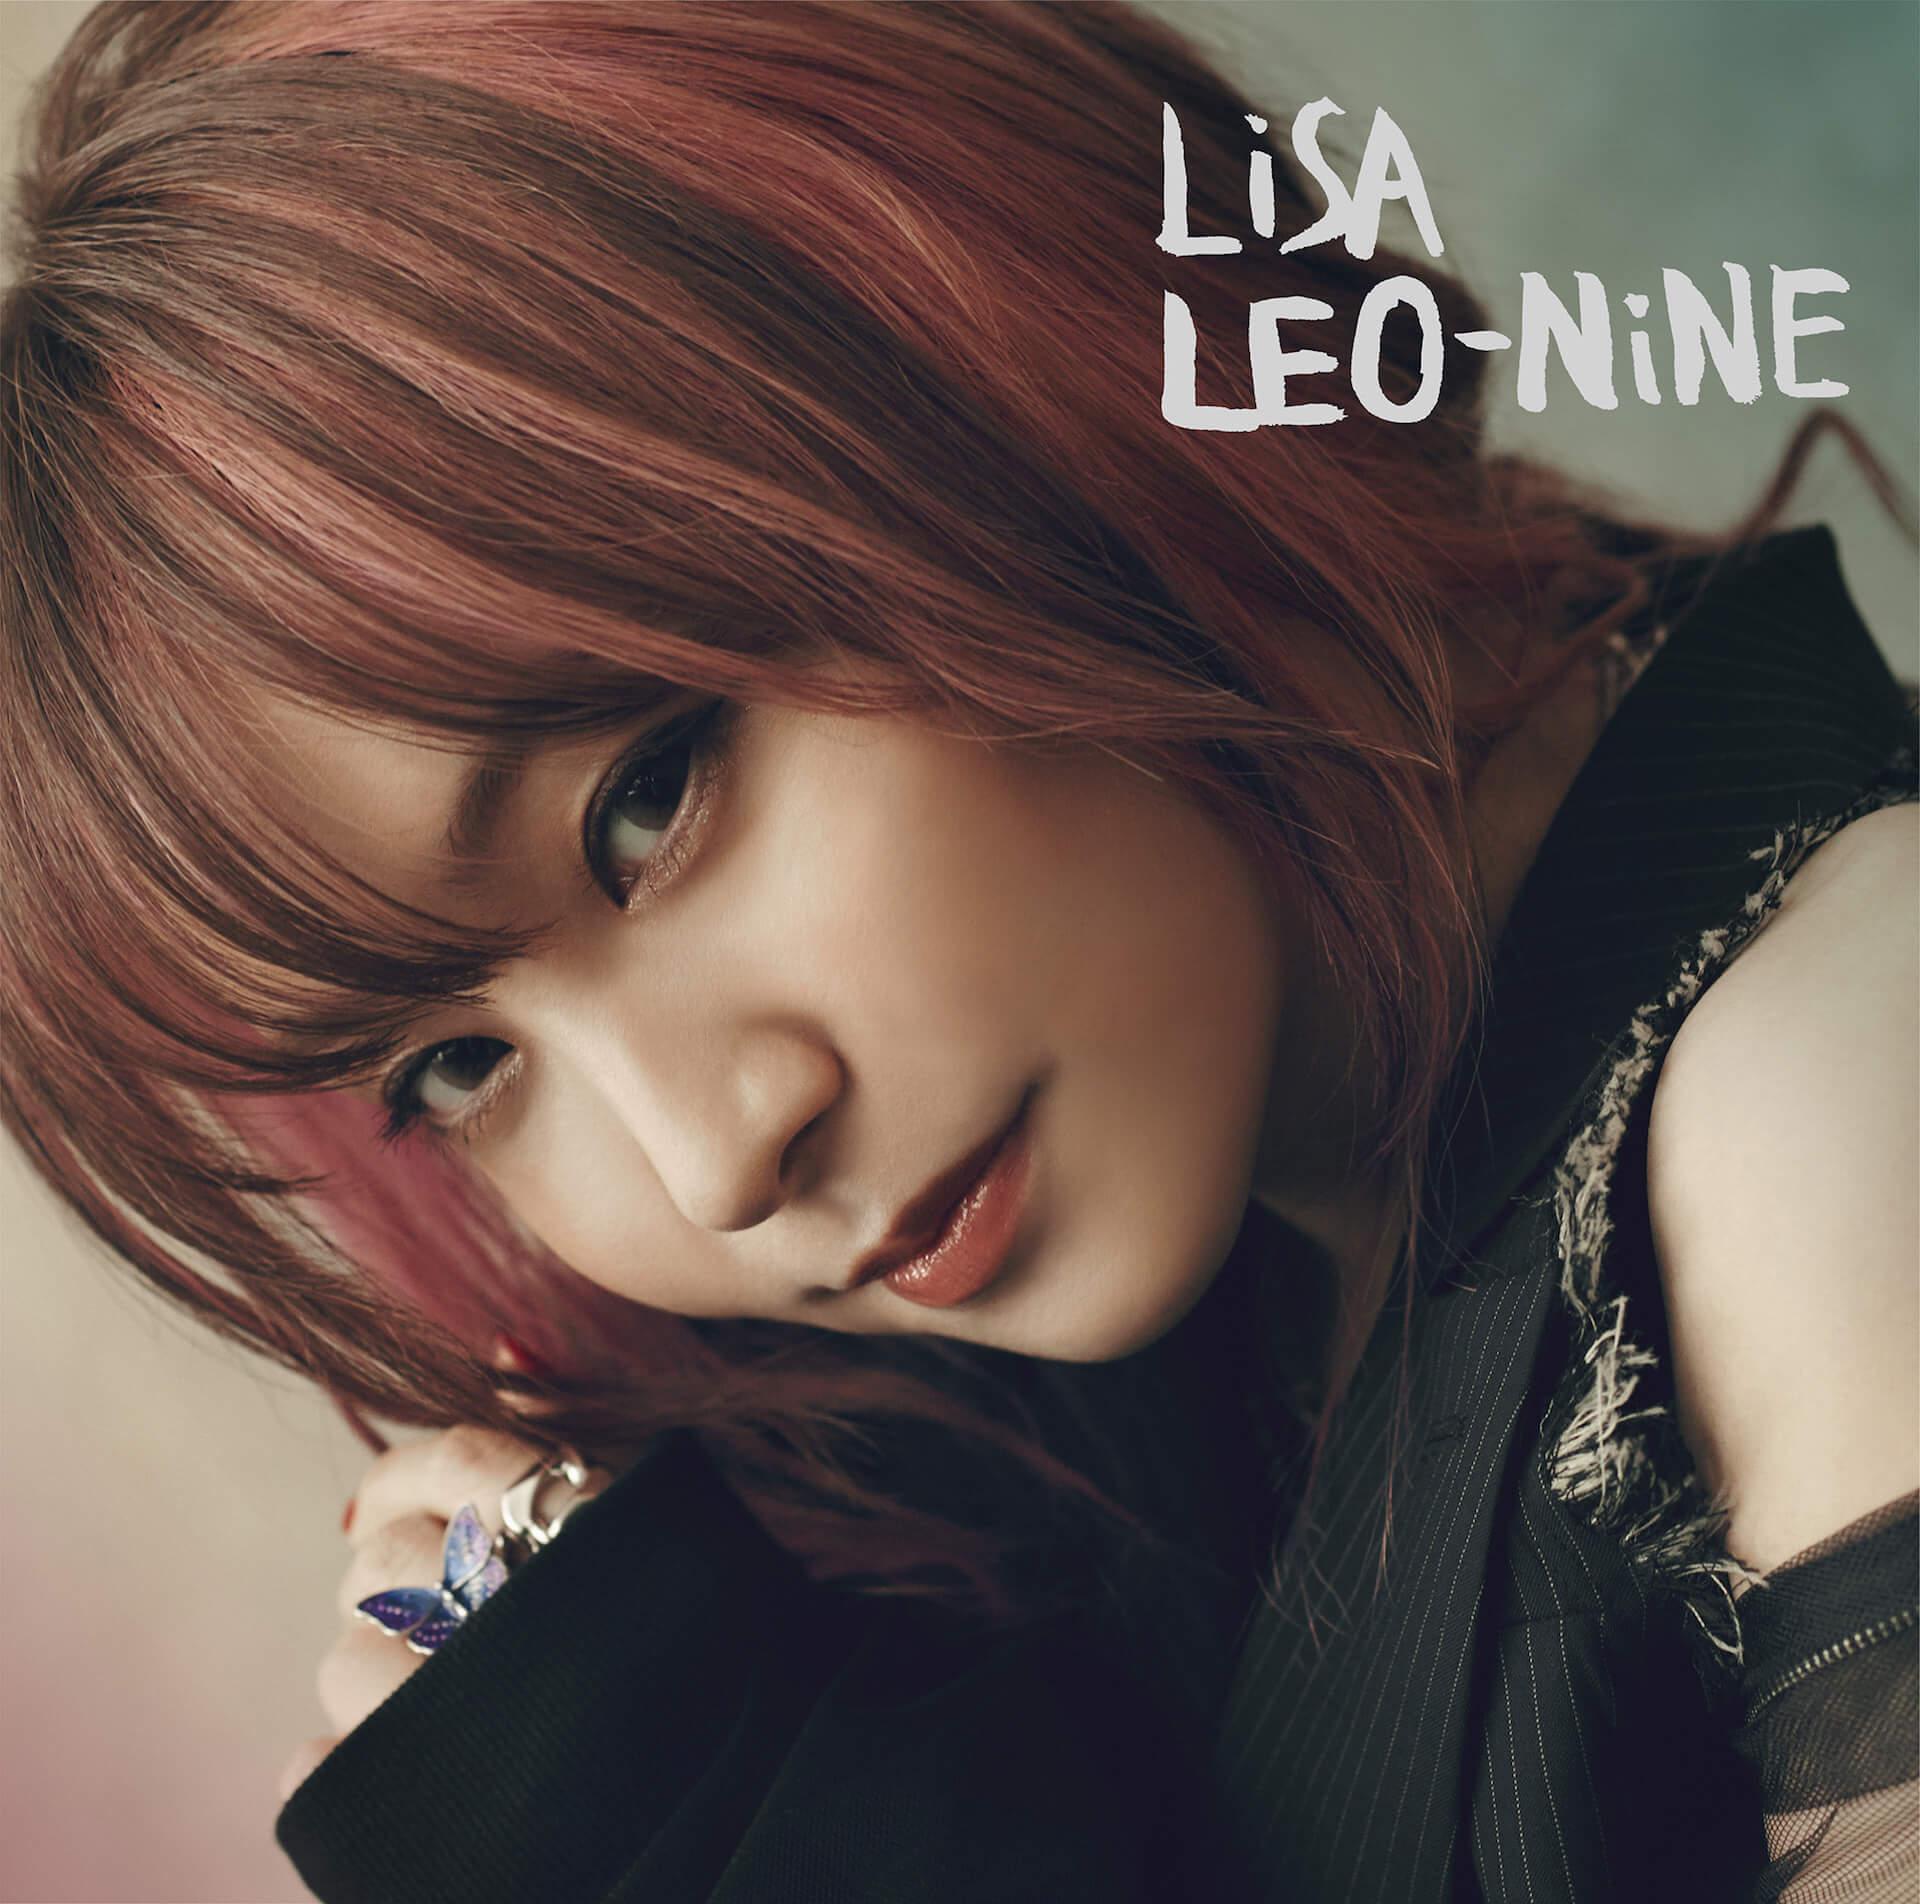 "LiSAによる『劇場版「鬼滅の刃」無限列車編』主題歌""炎""がシングルリリース決定&MVも公開!大ヒット曲""紅蓮華""を収録したアルバム『LEO-NiNE』も発表 music201013_kimetsunoyaiba_lisa_5"